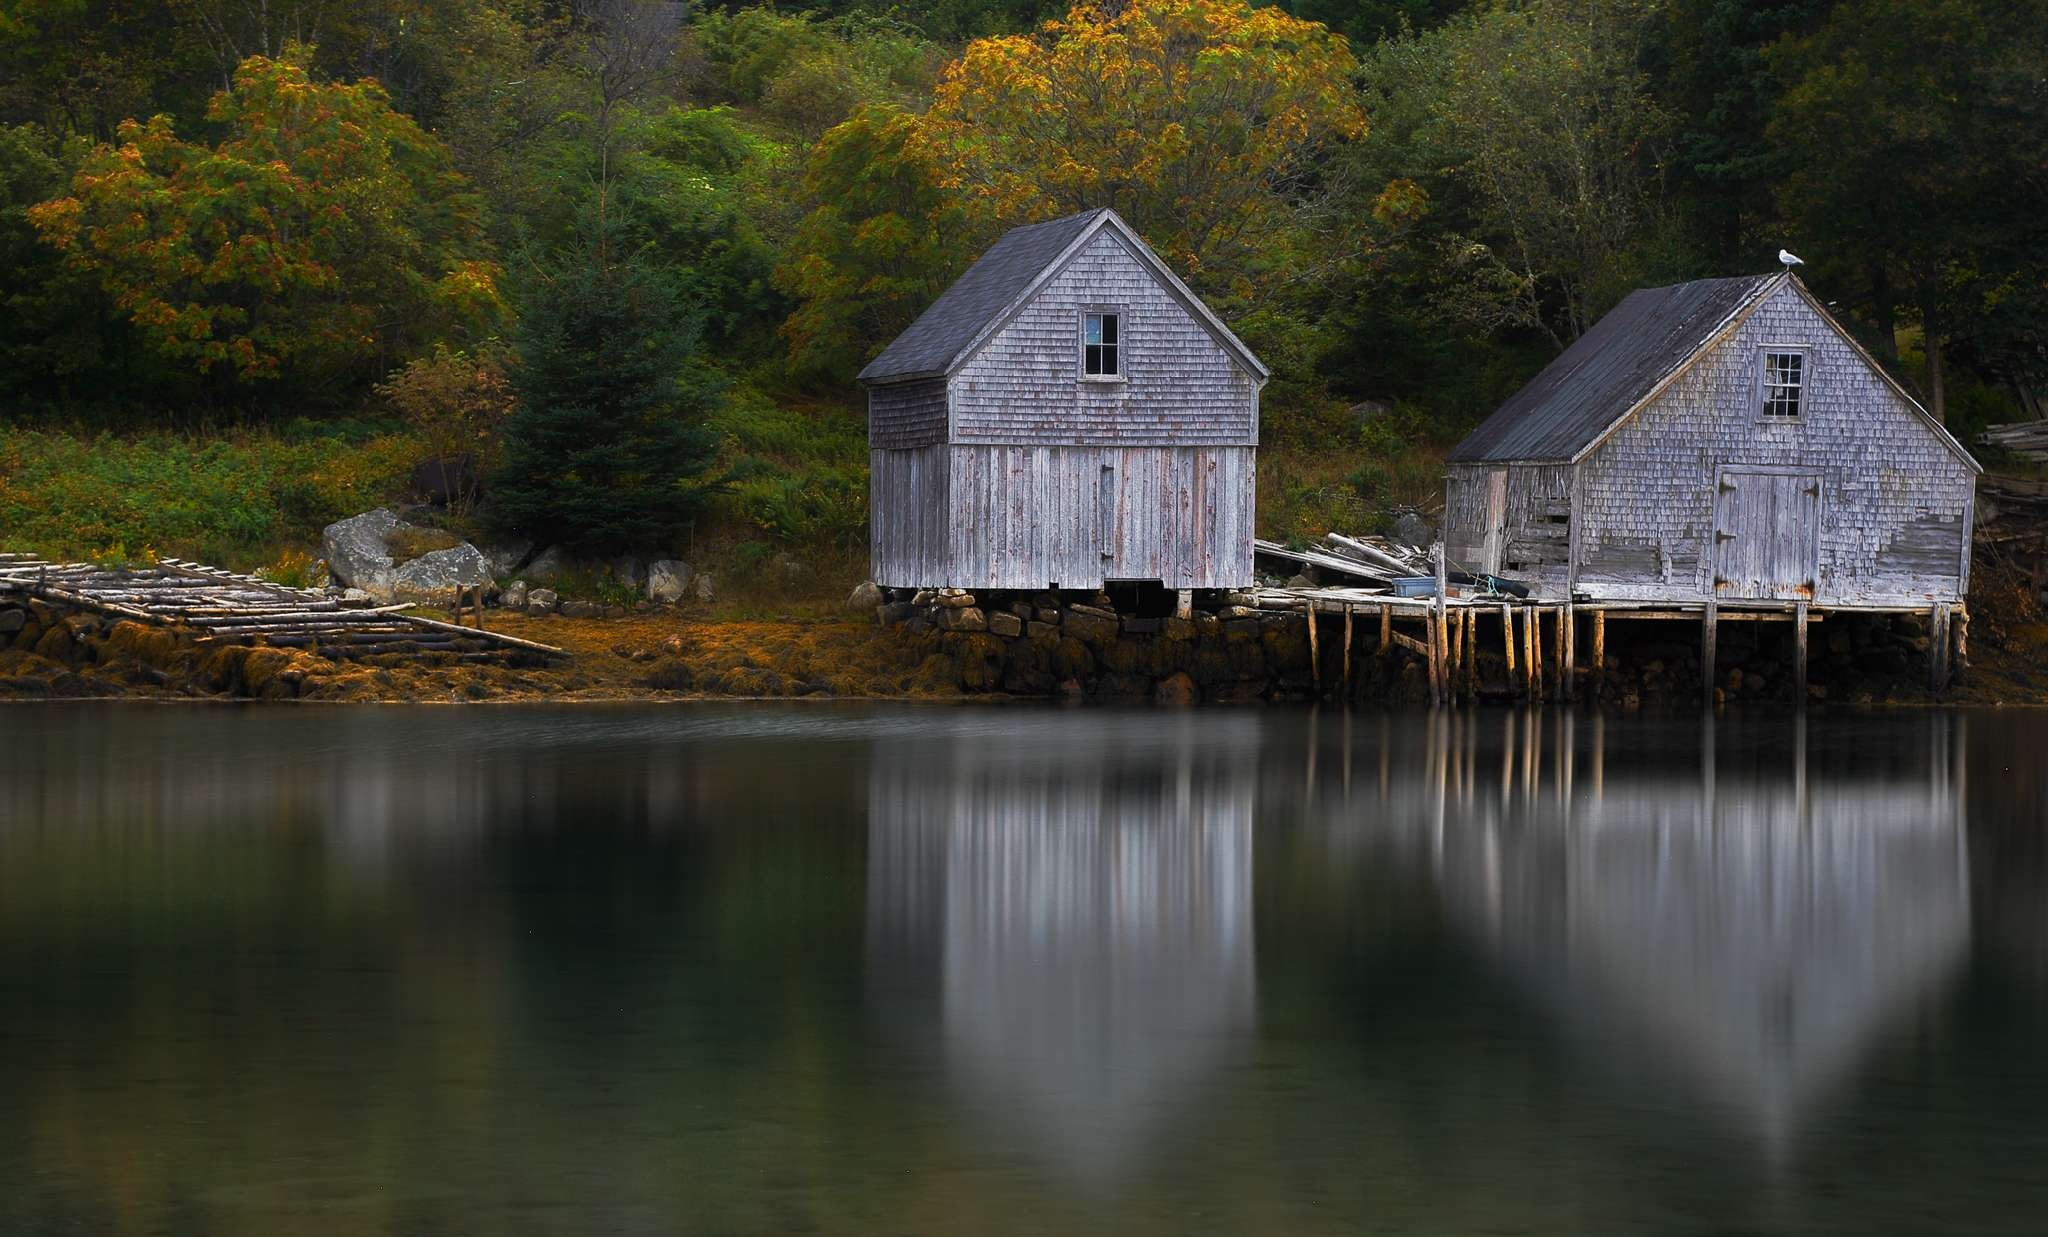 Boutiliers Cove, Nova Scotia by Paul Berkloo